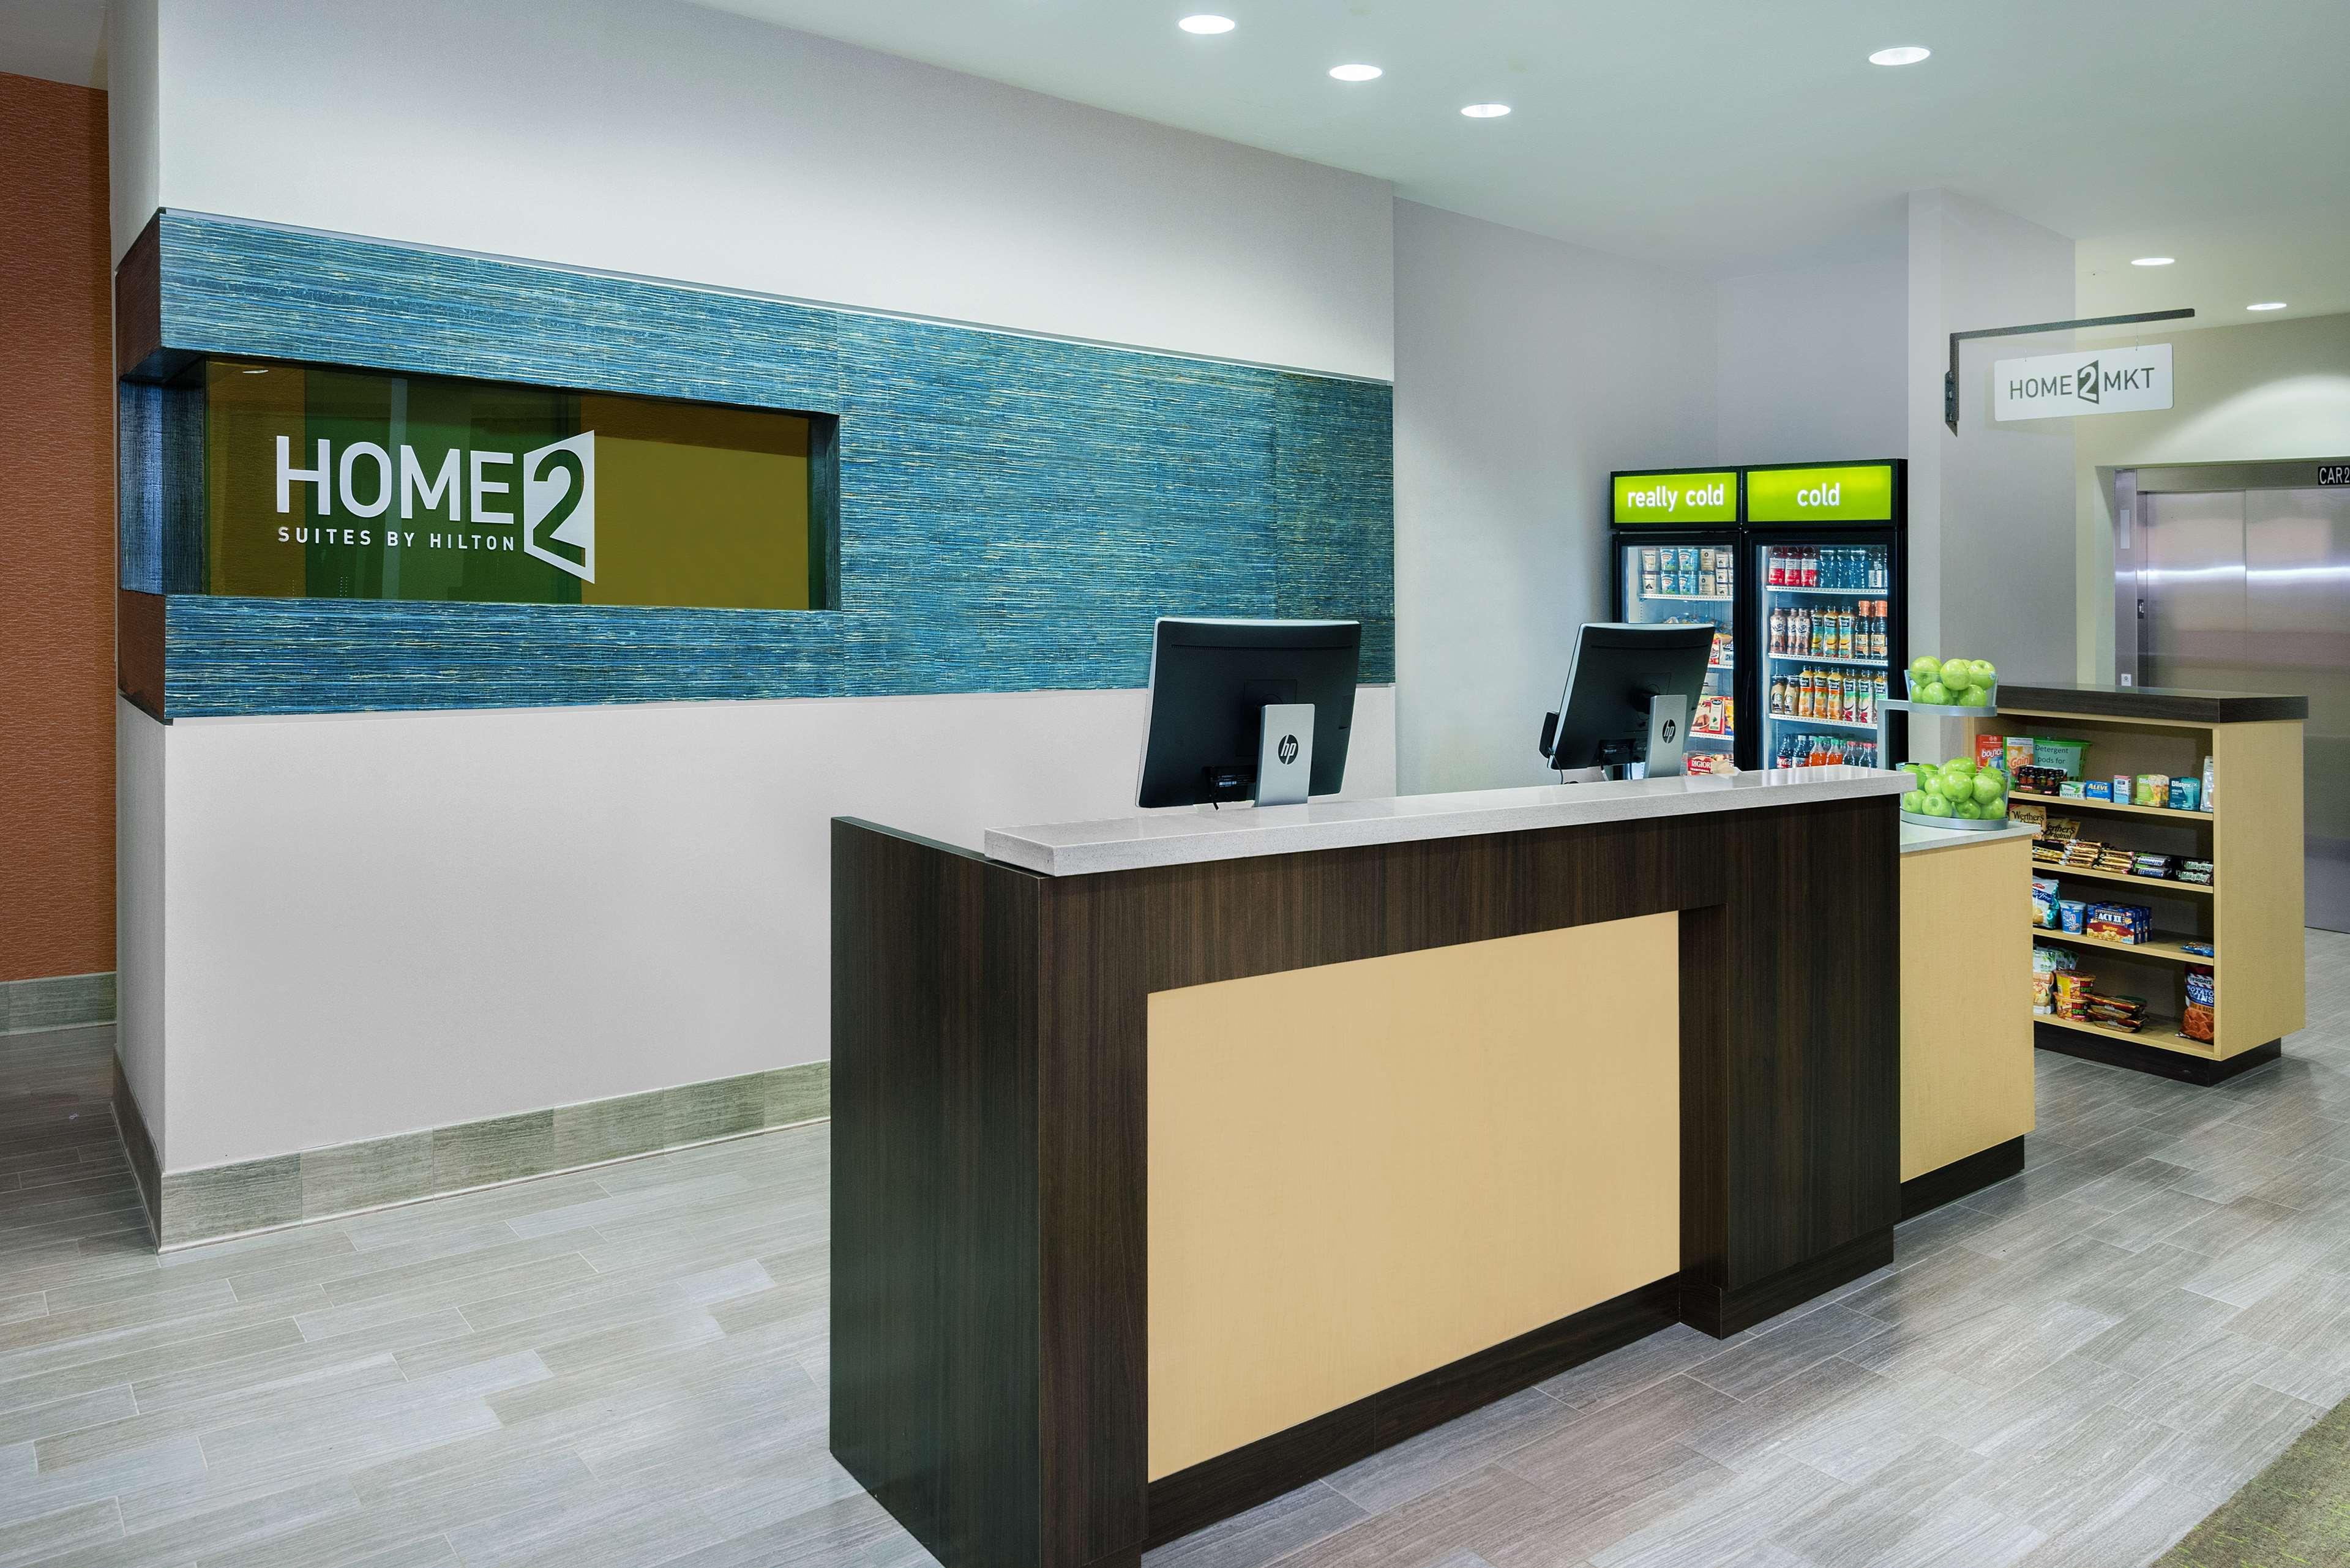 Home2 Suites by Hilton Austin Airport image 5